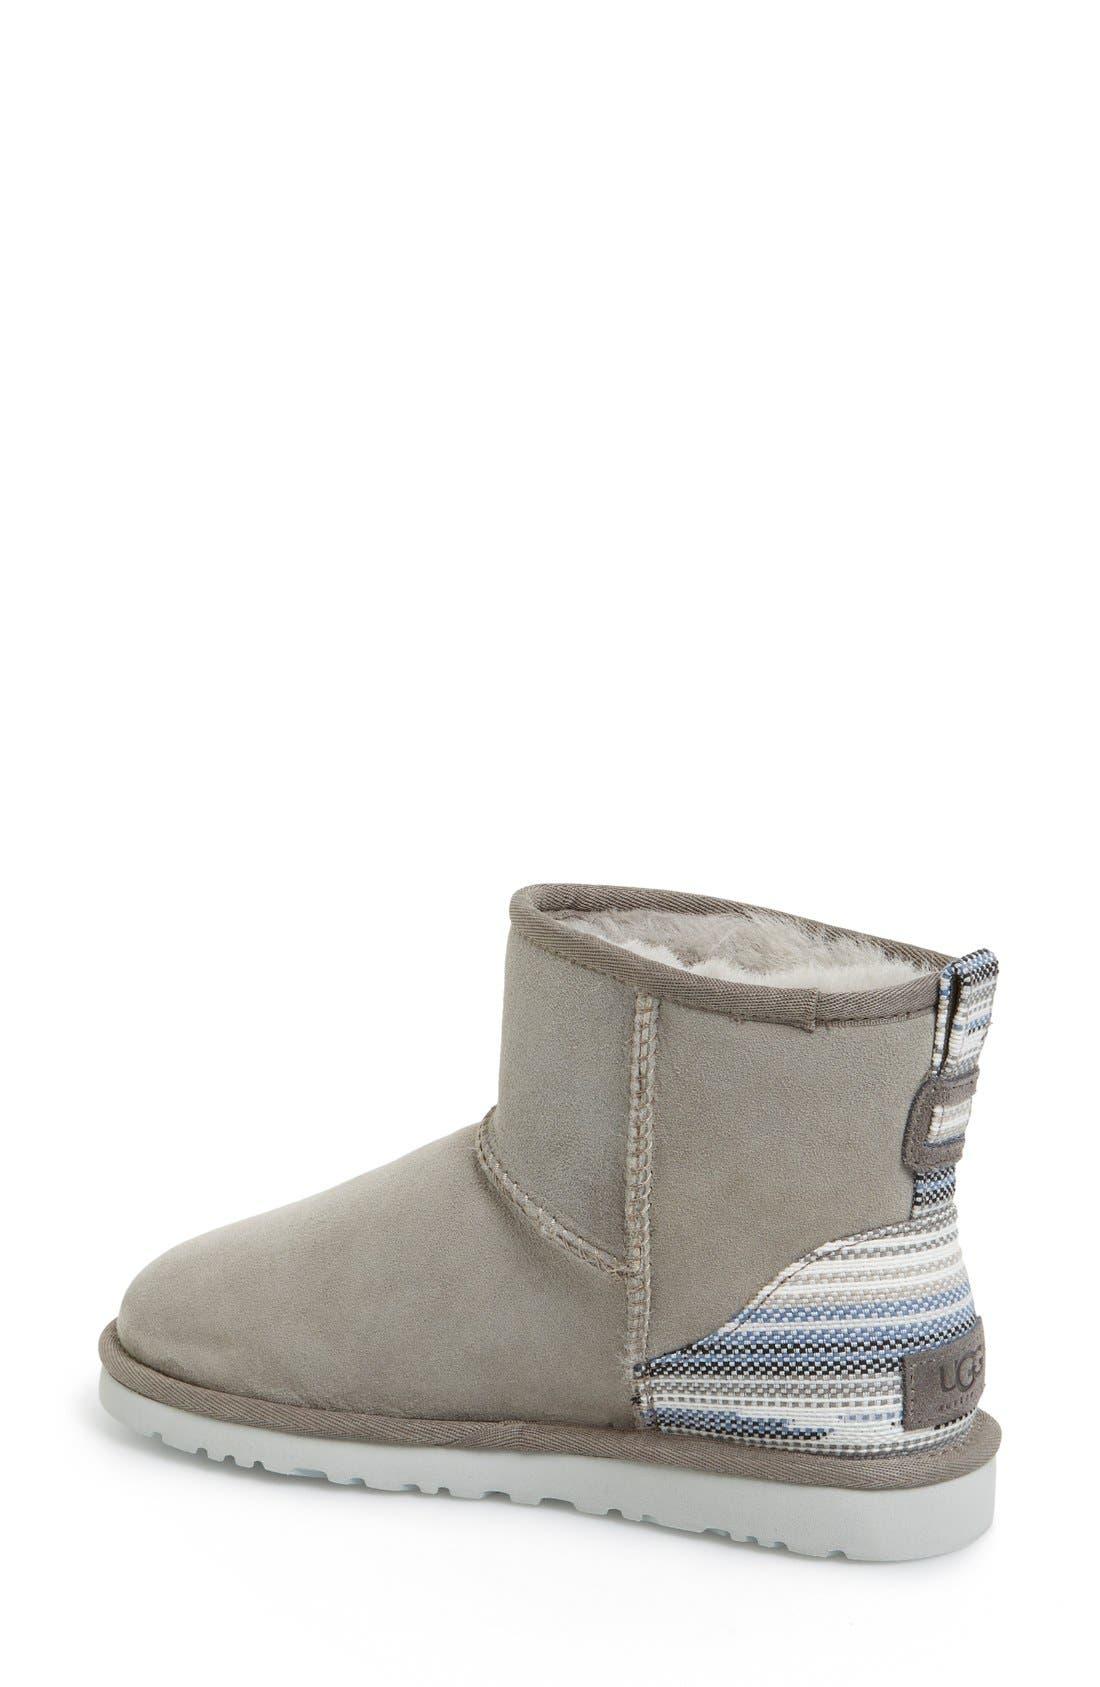 'Classic Mini Serape' Genuine Shearling Lined Boot,                             Alternate thumbnail 3, color,                             024